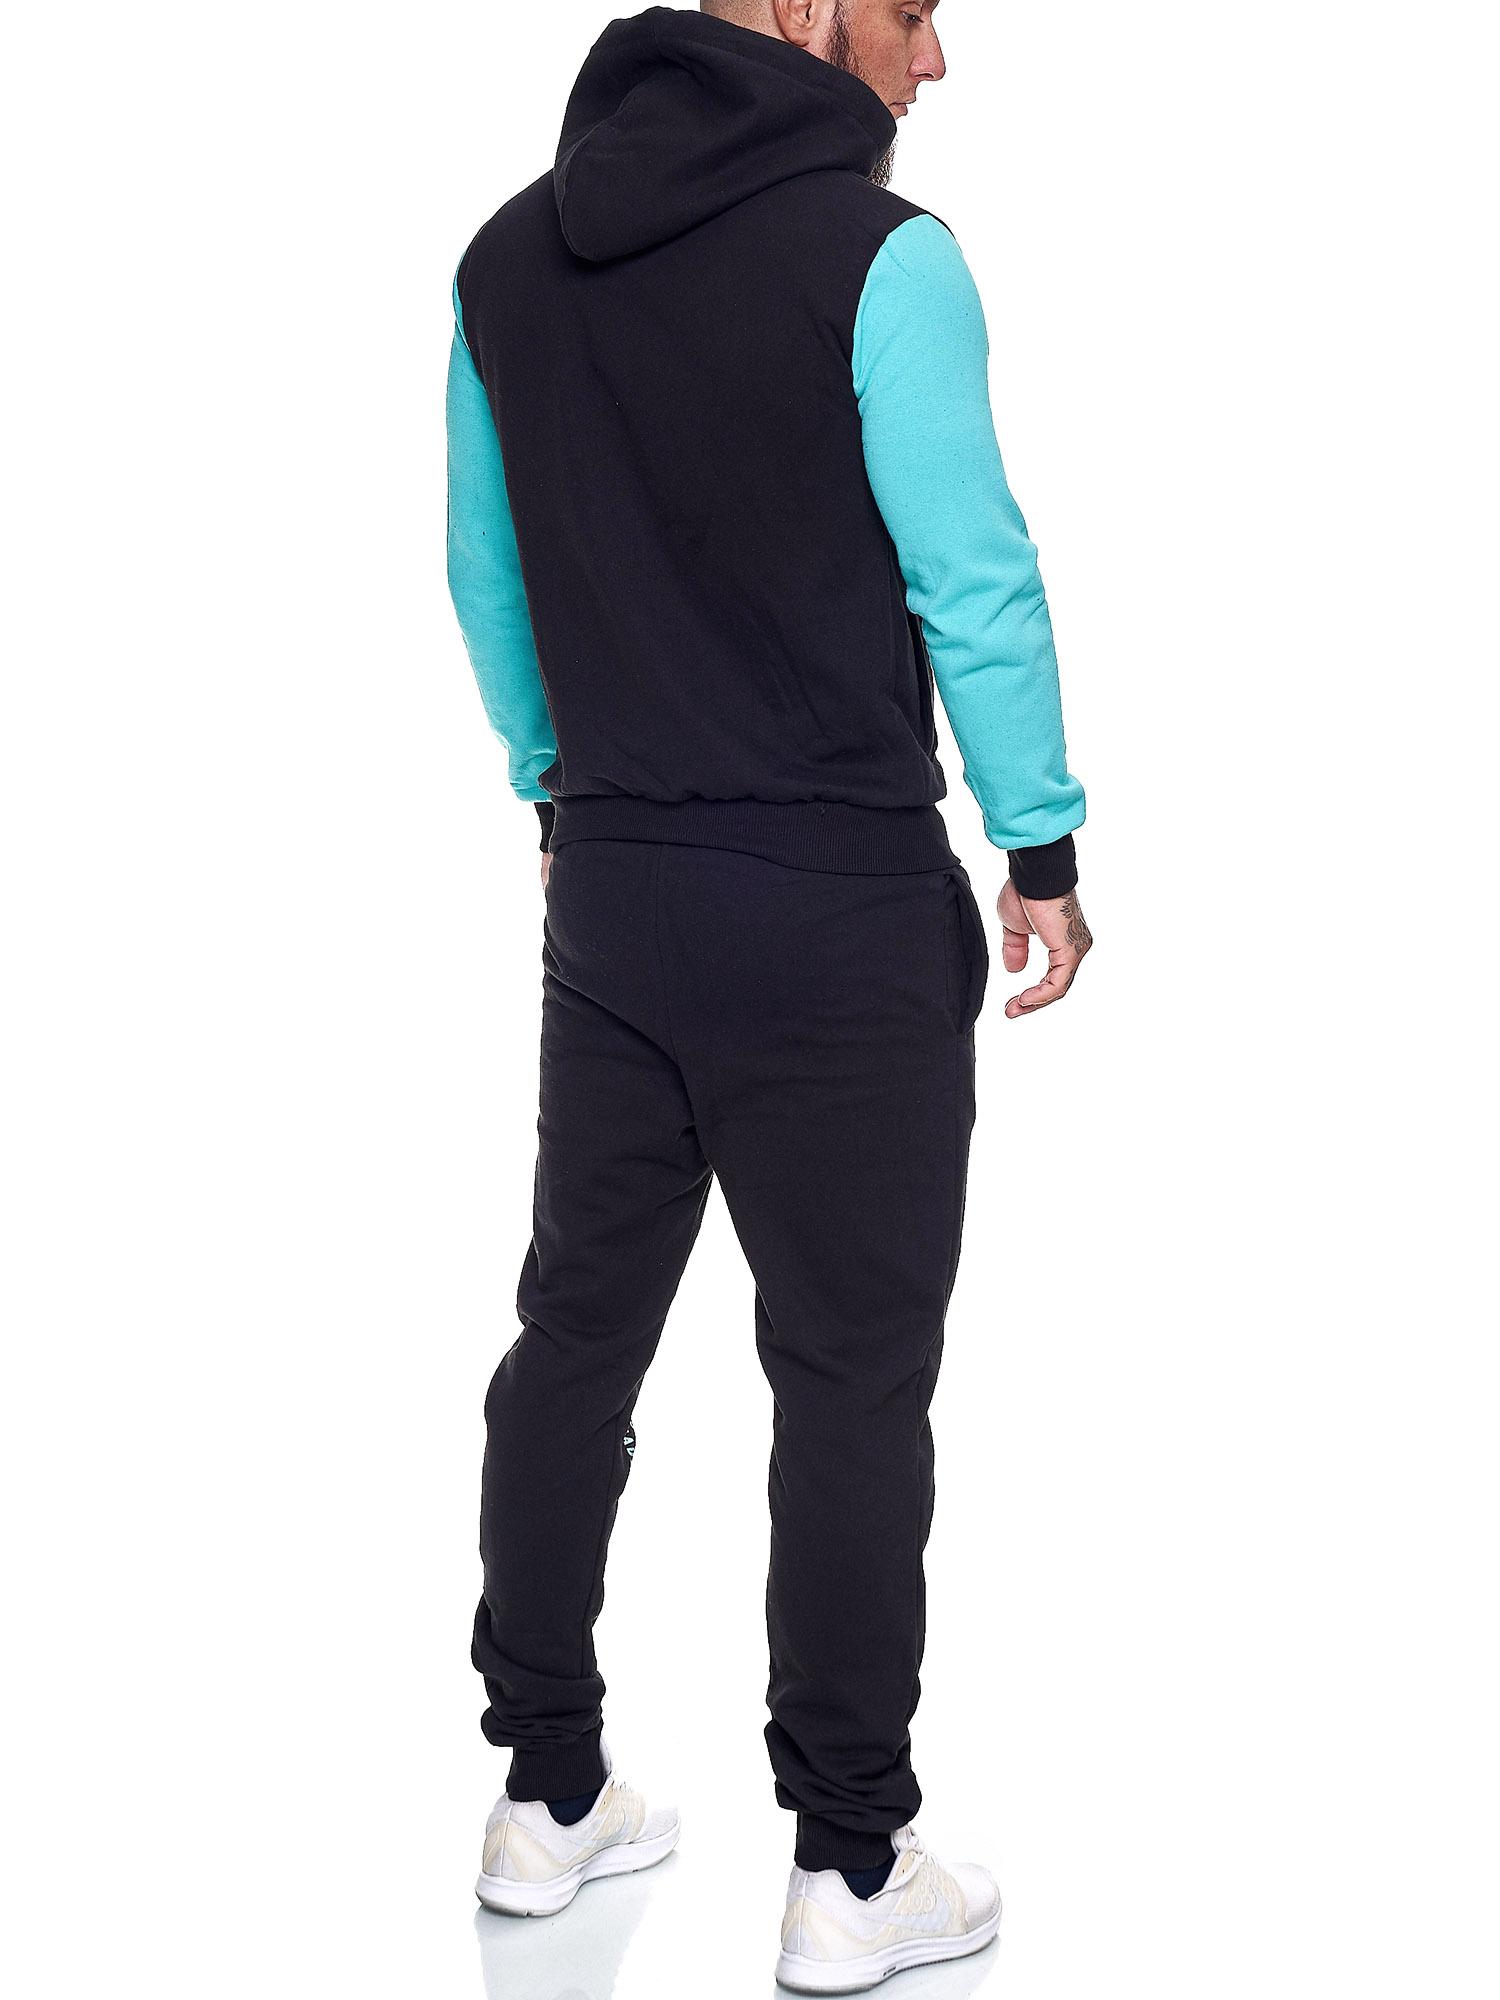 Damen-Jogginganzug-Frauen-Trainingsanzug-Sportanzug-Streetwear-JG-512-John-Kayna Indexbild 45